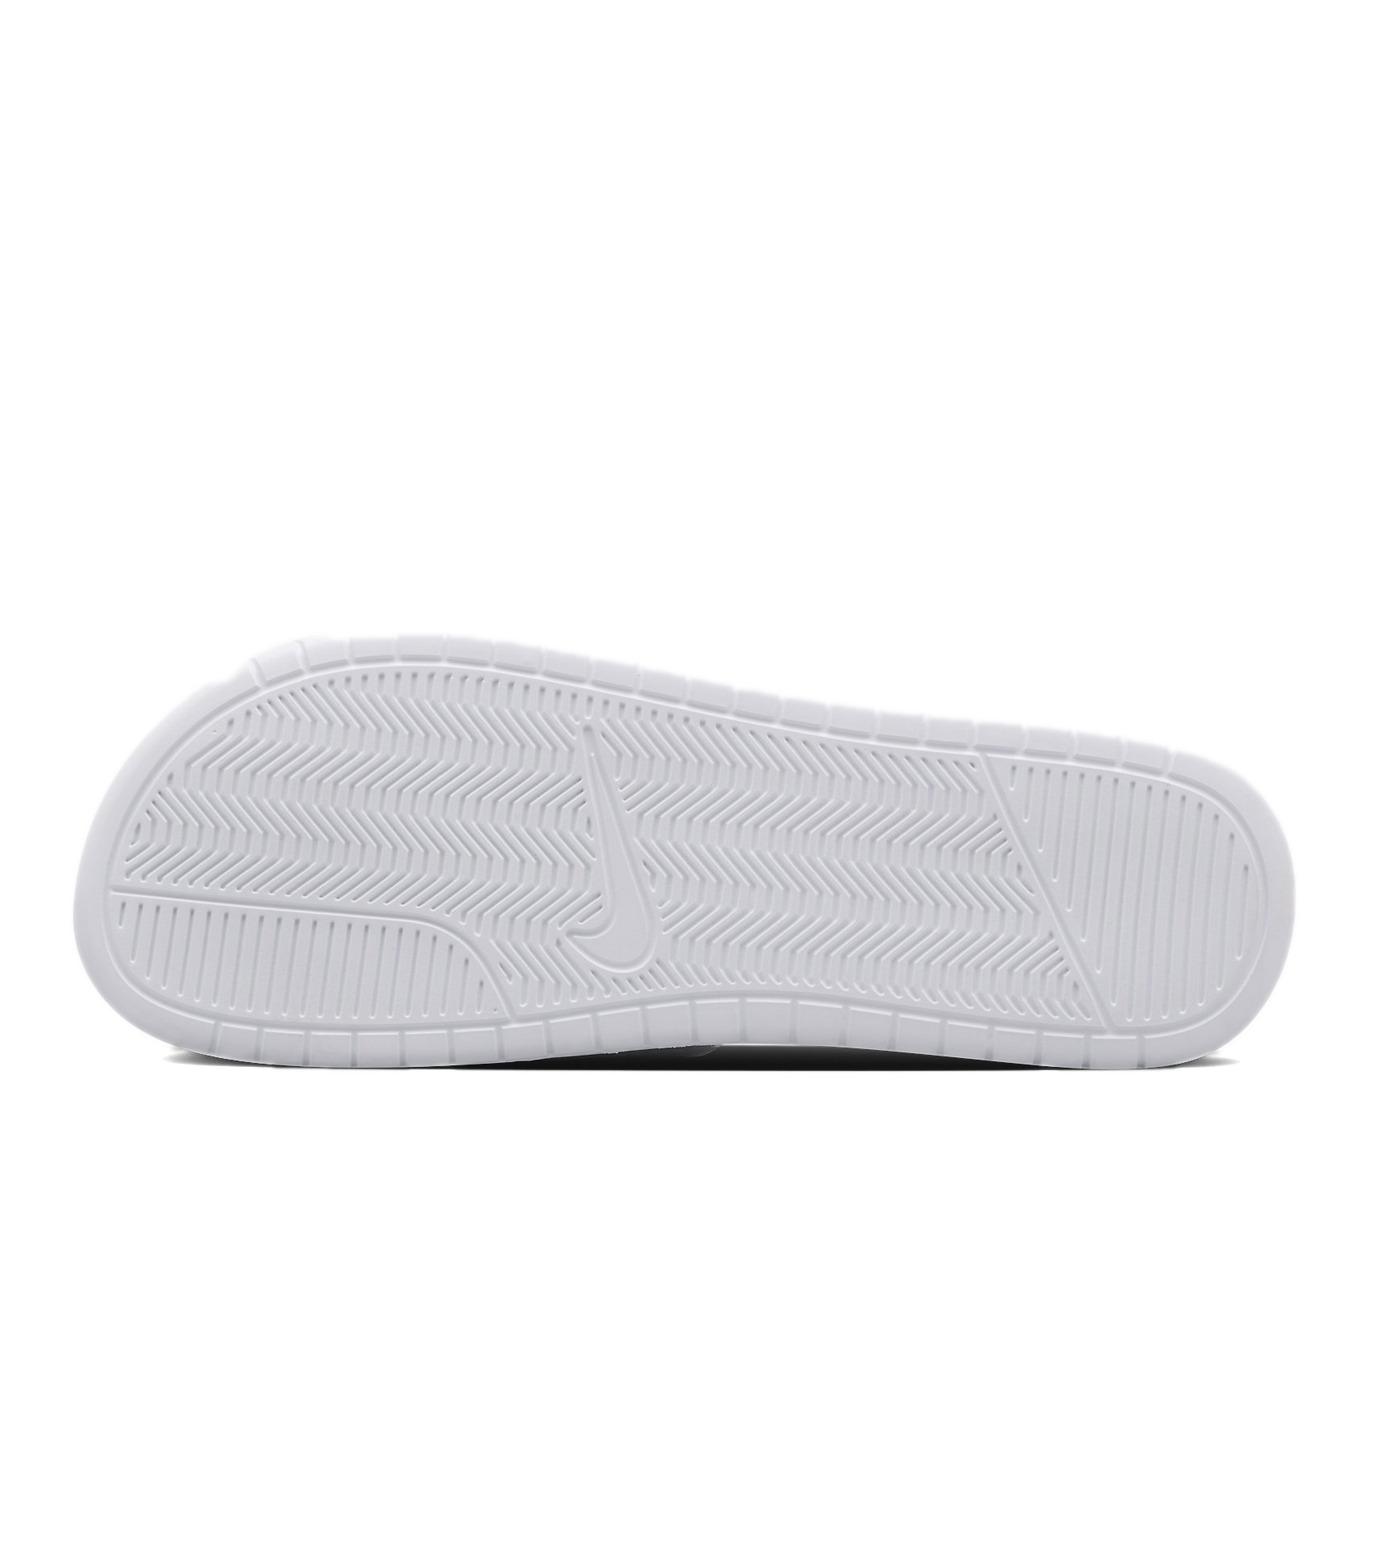 NIKE(ナイキ)のBenassi Slide Lux-WHITE(シューズ/shoes)-818742-100-4 拡大詳細画像2